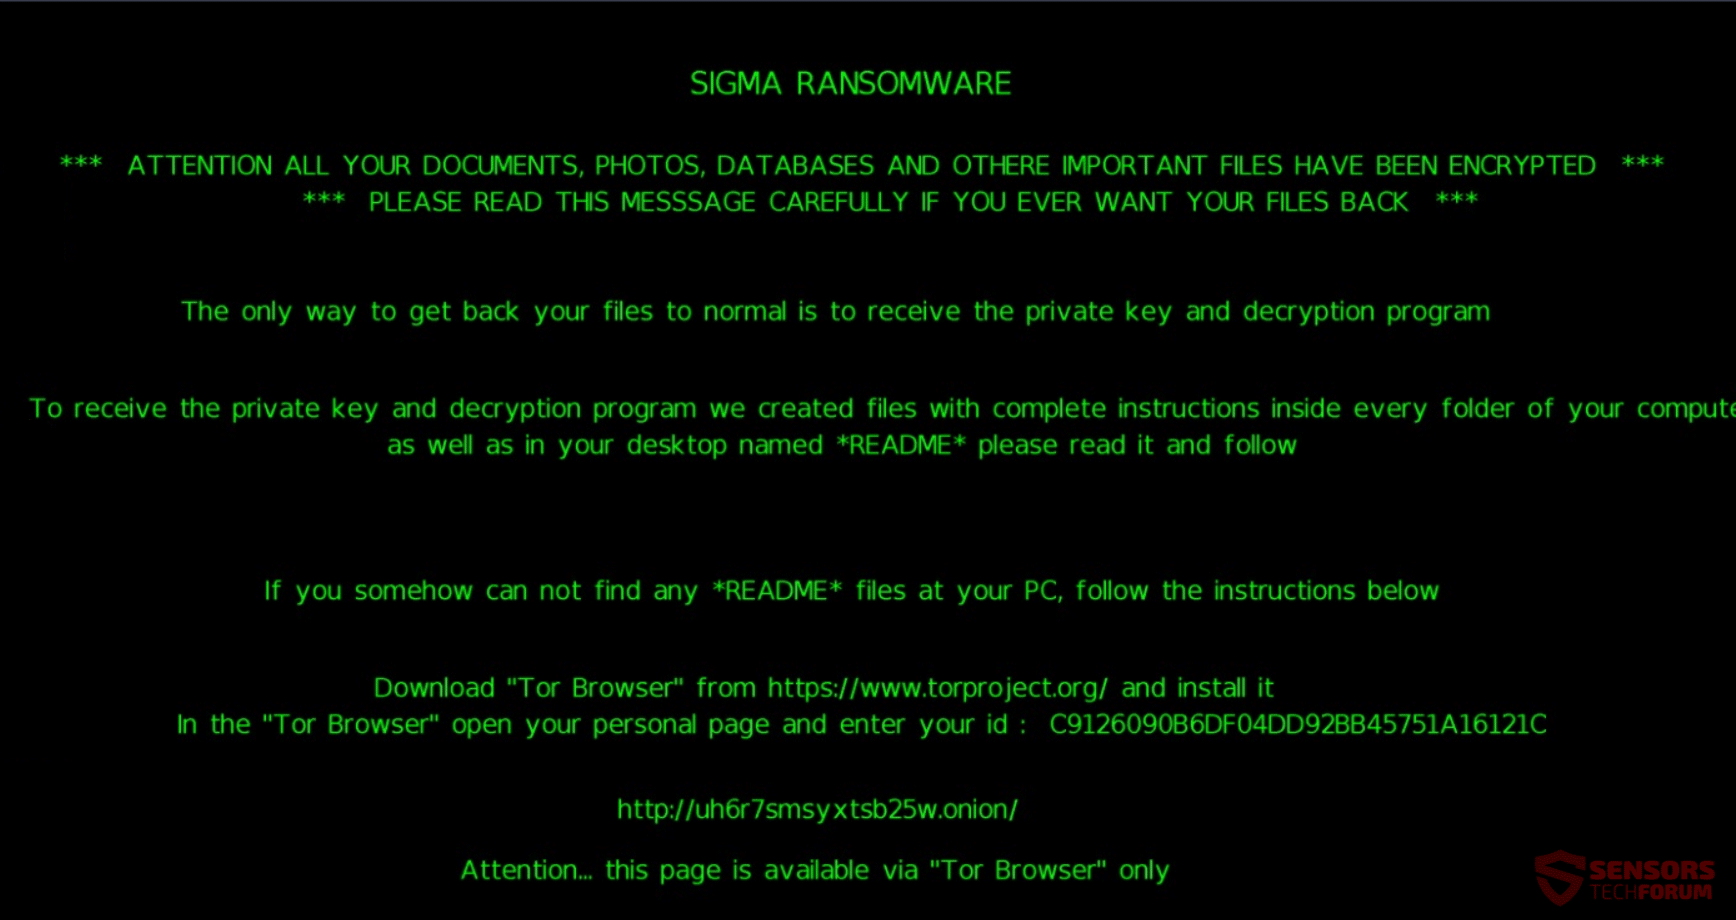 Retire Sigma ransomware - Restaurar archivos